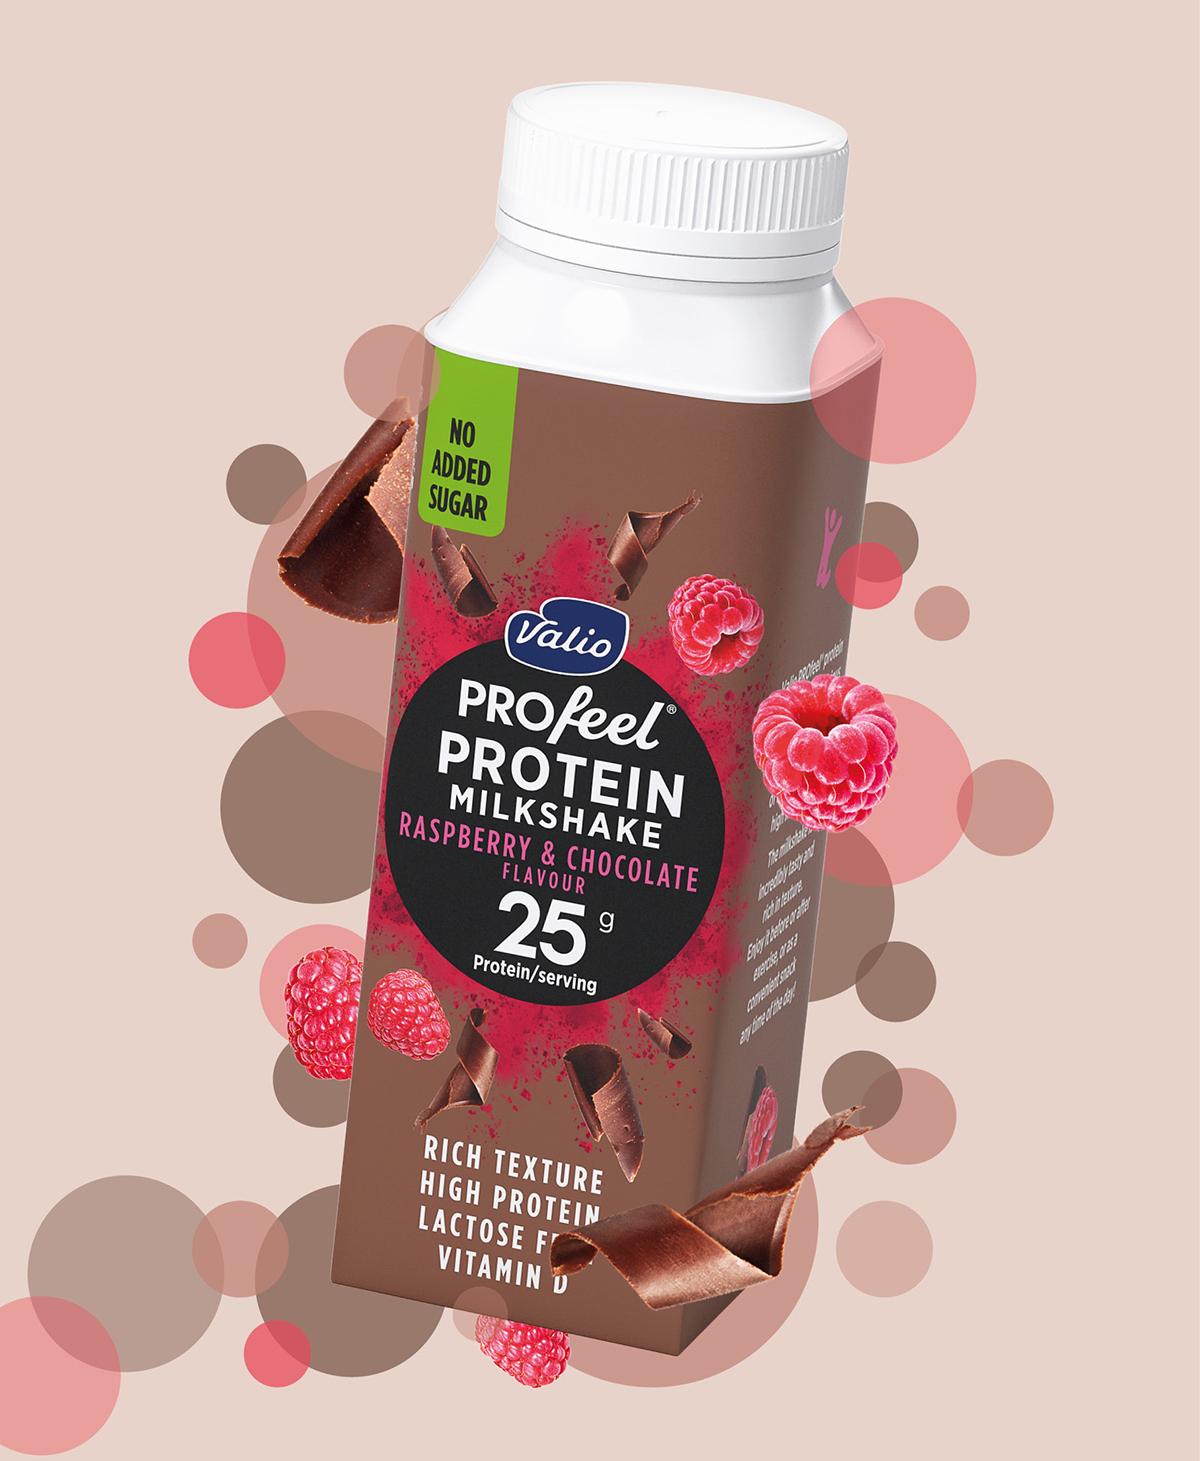 proteinrika mellanmål